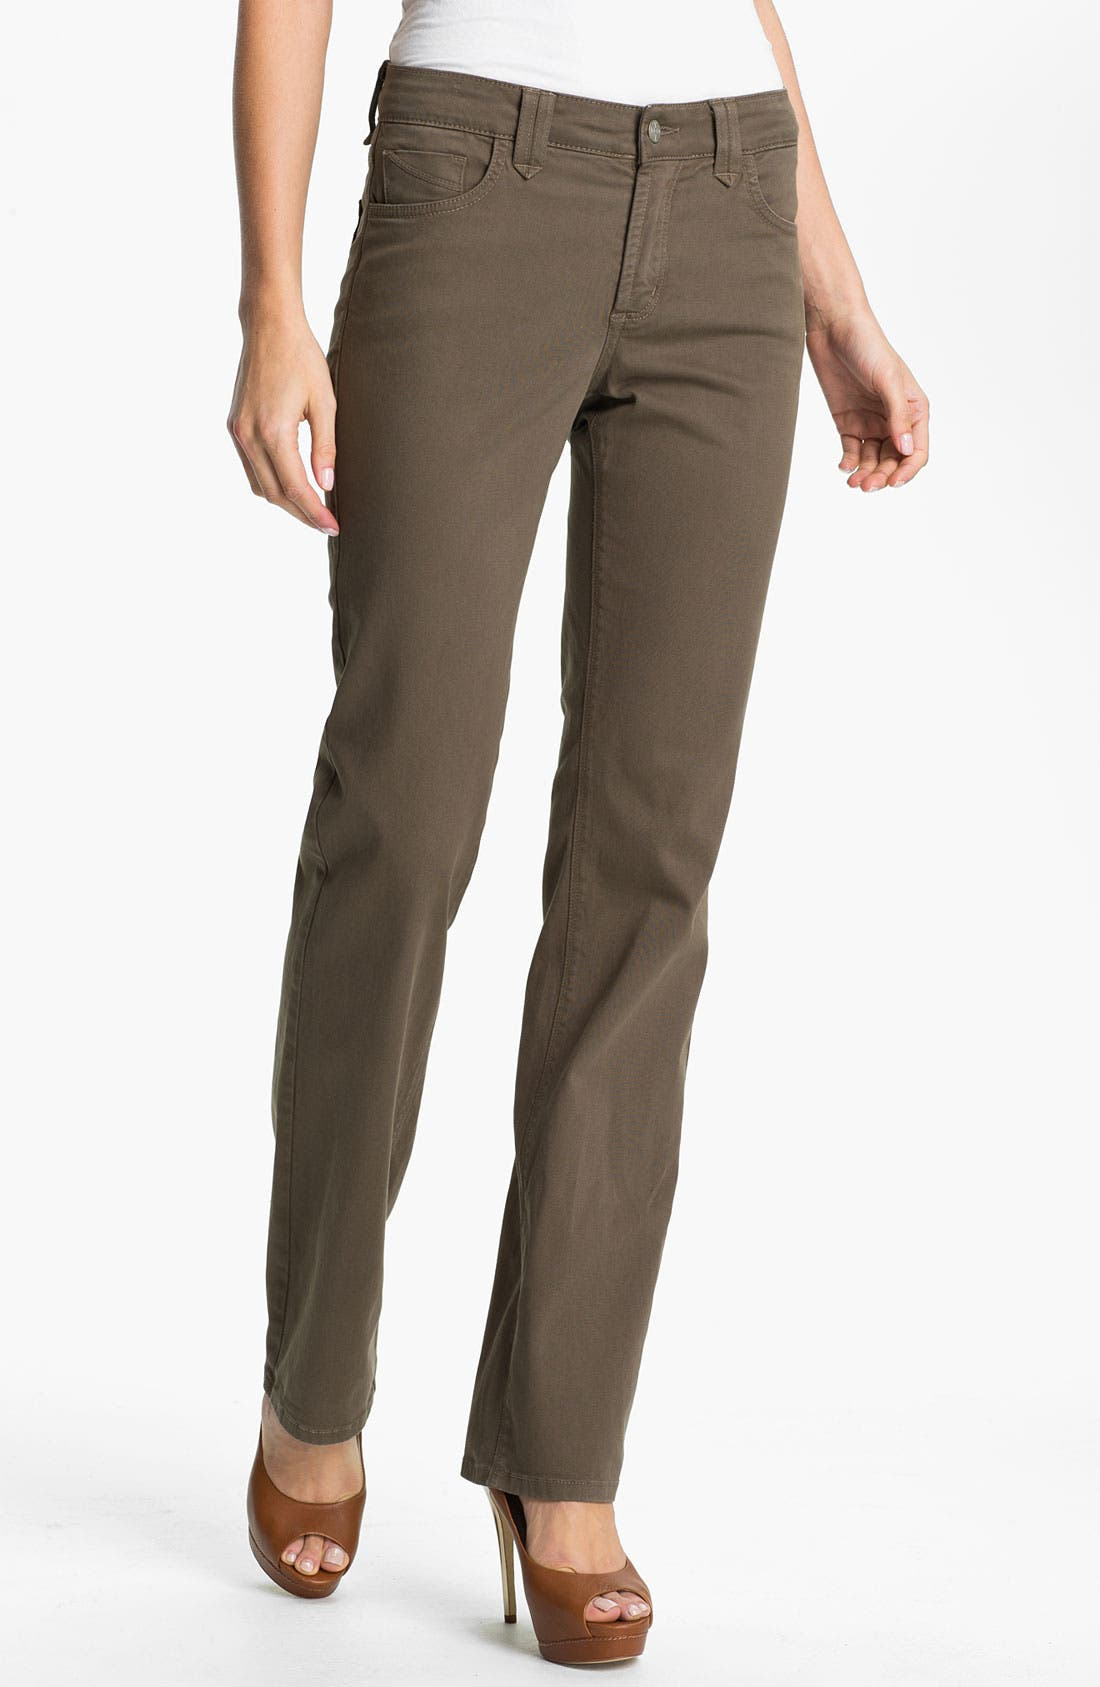 Alternate Image 1 Selected - NYDJ 'Hayden' Straight Leg Twill Jeans